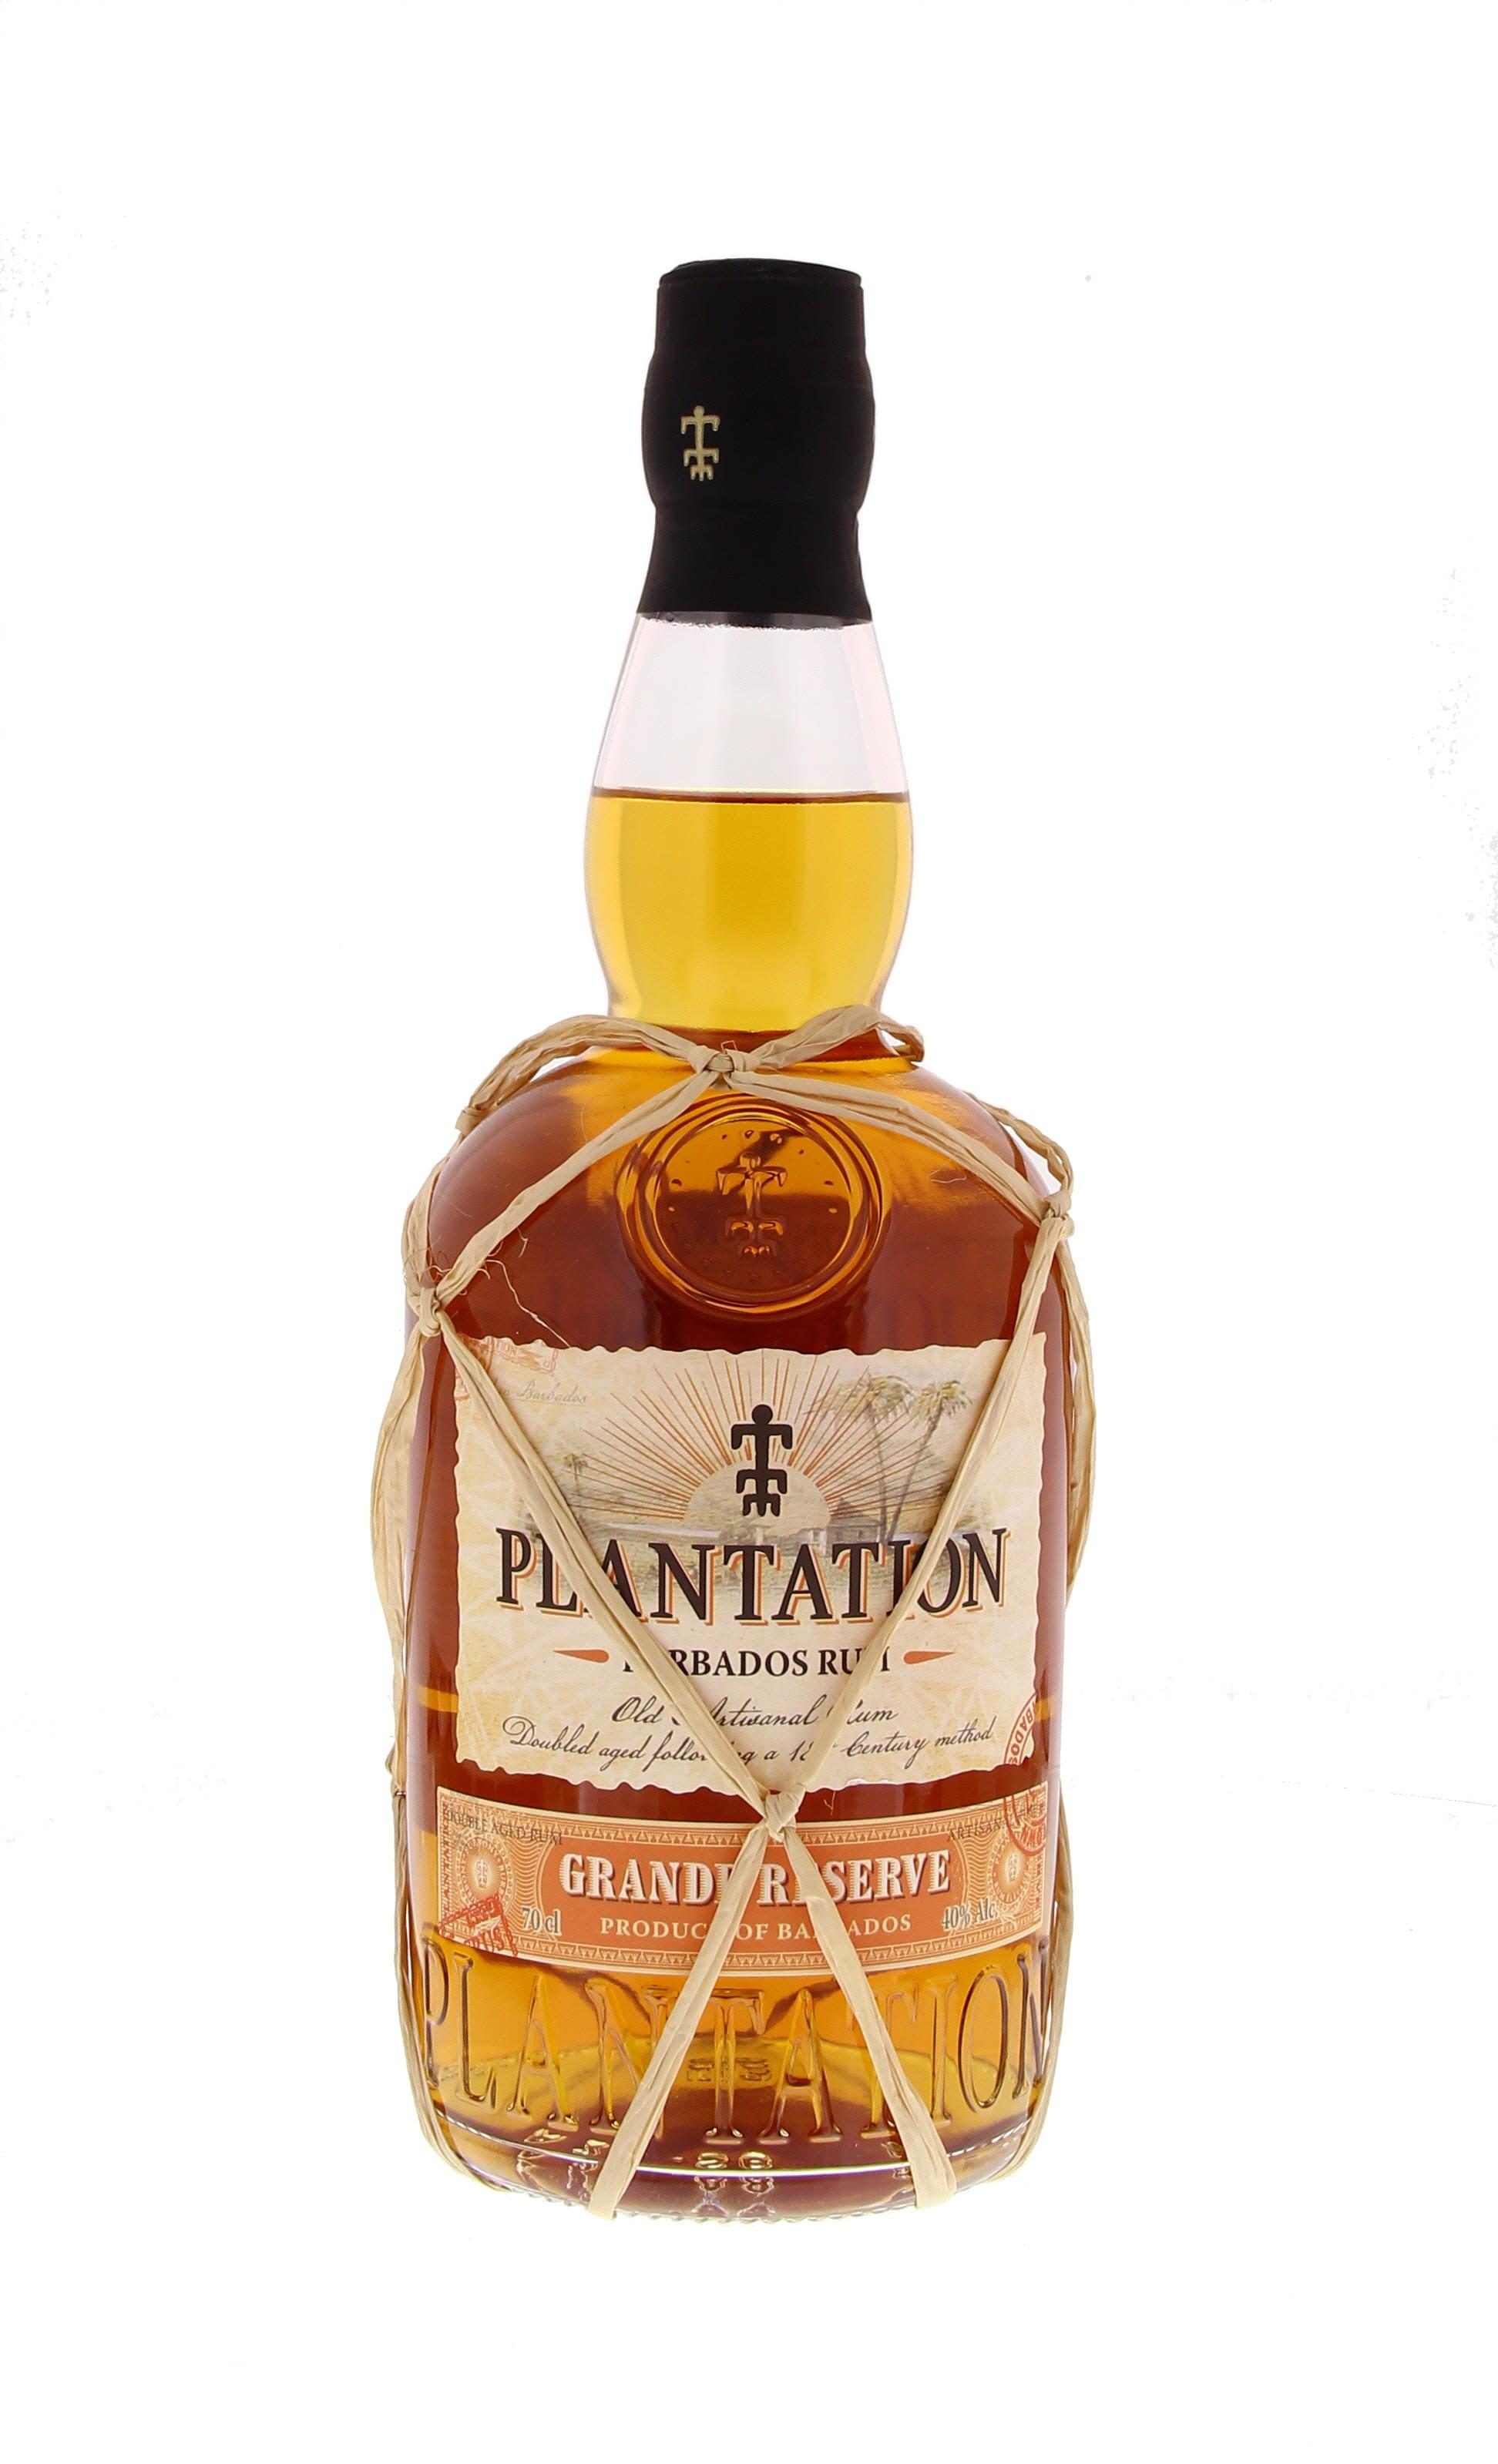 Plantation Rum Barbados Grande Reserve 40° 0.7L